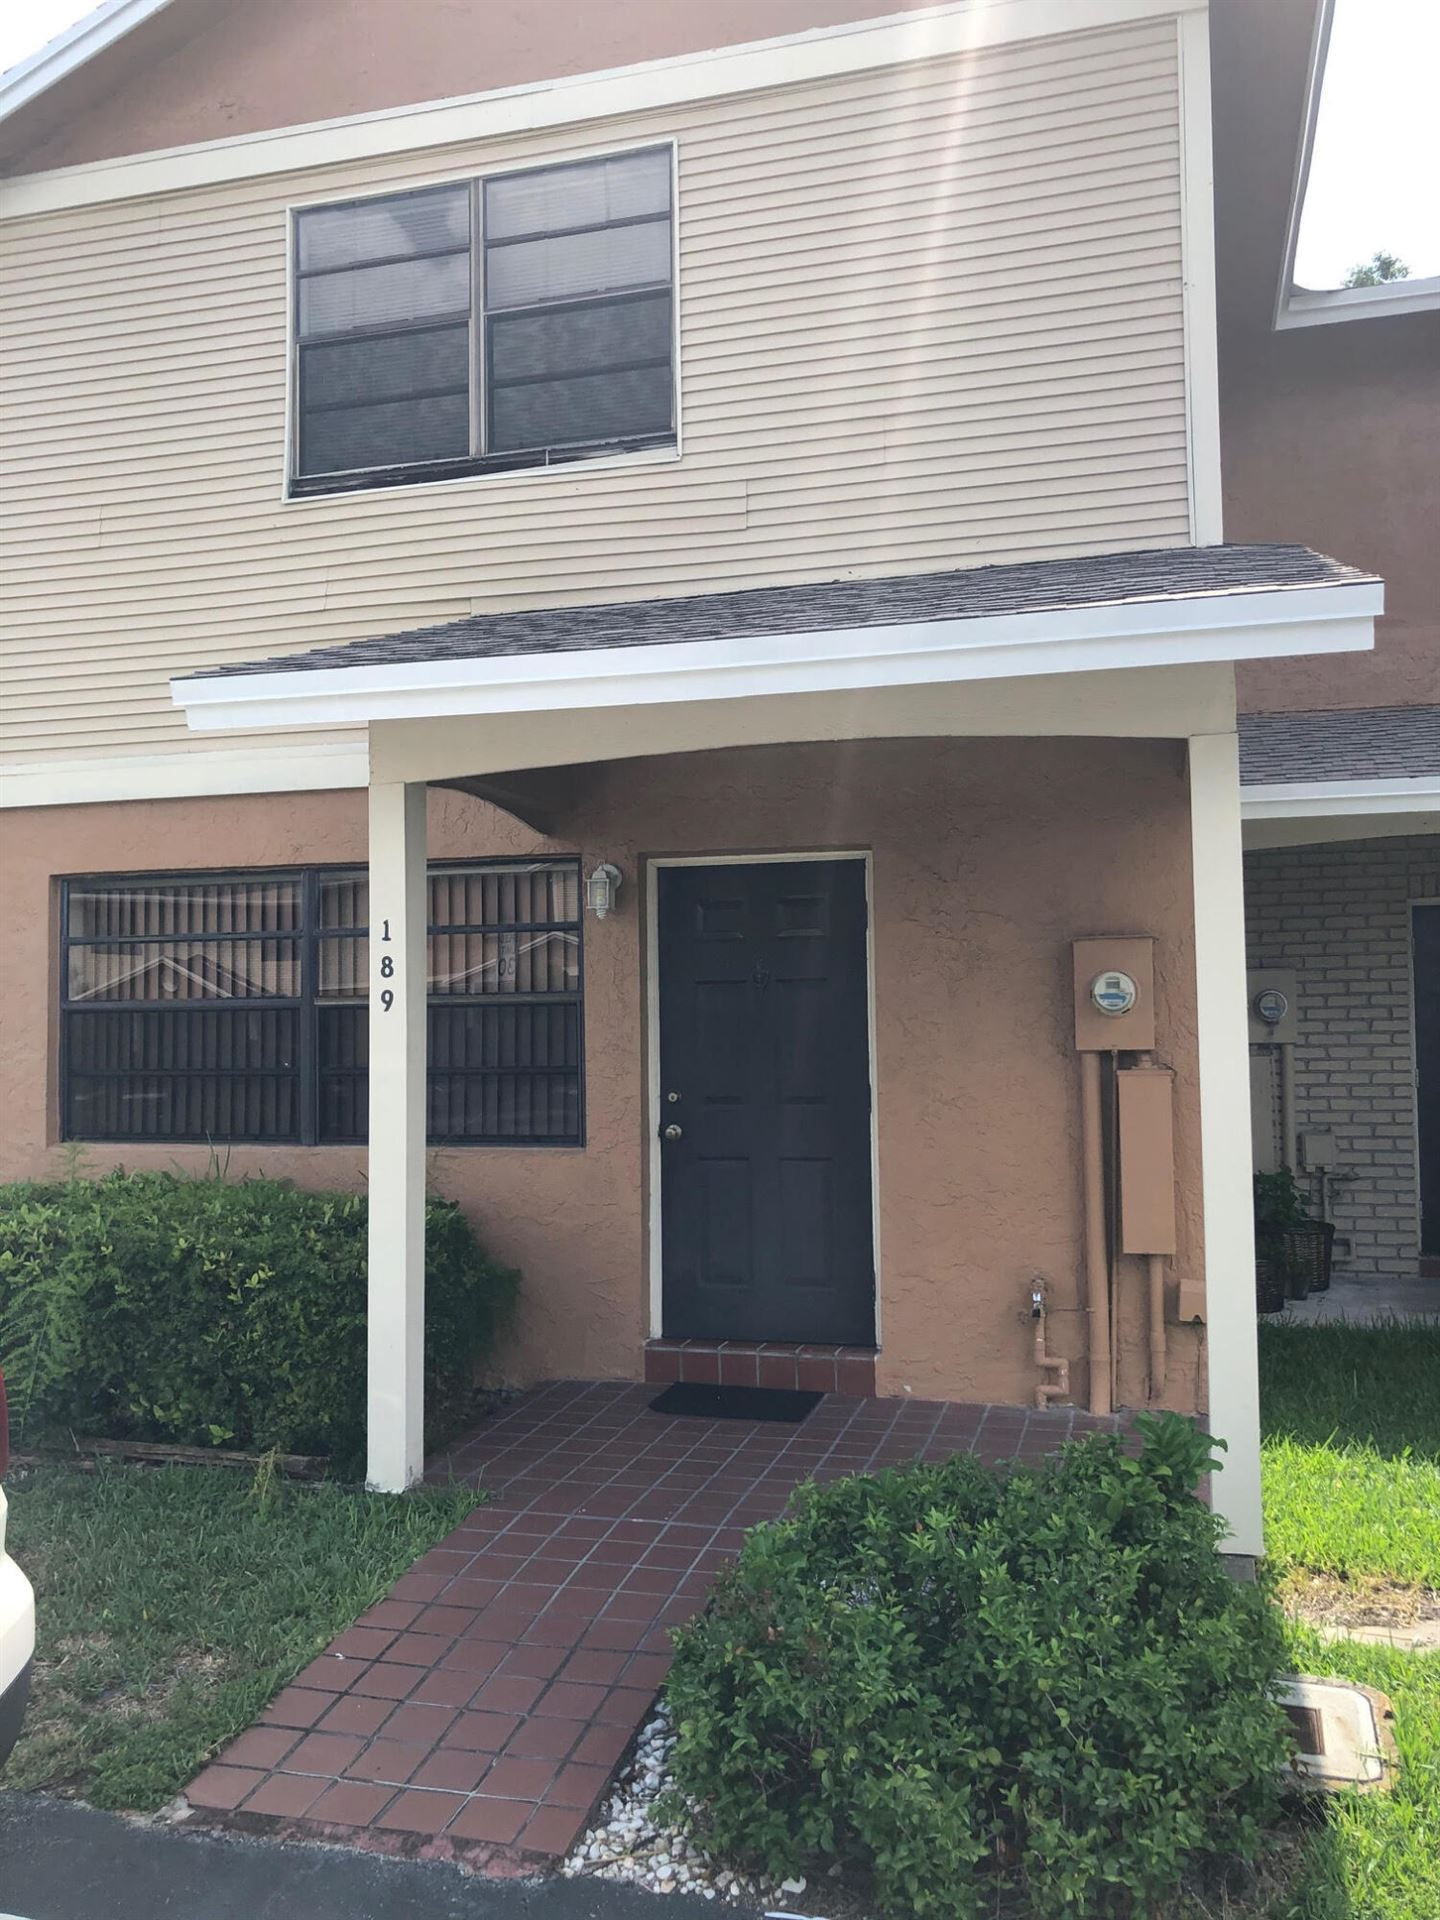 189 NW 106 Avenue, Pembroke Pines, FL 33026 - MLS#: RX-10716491